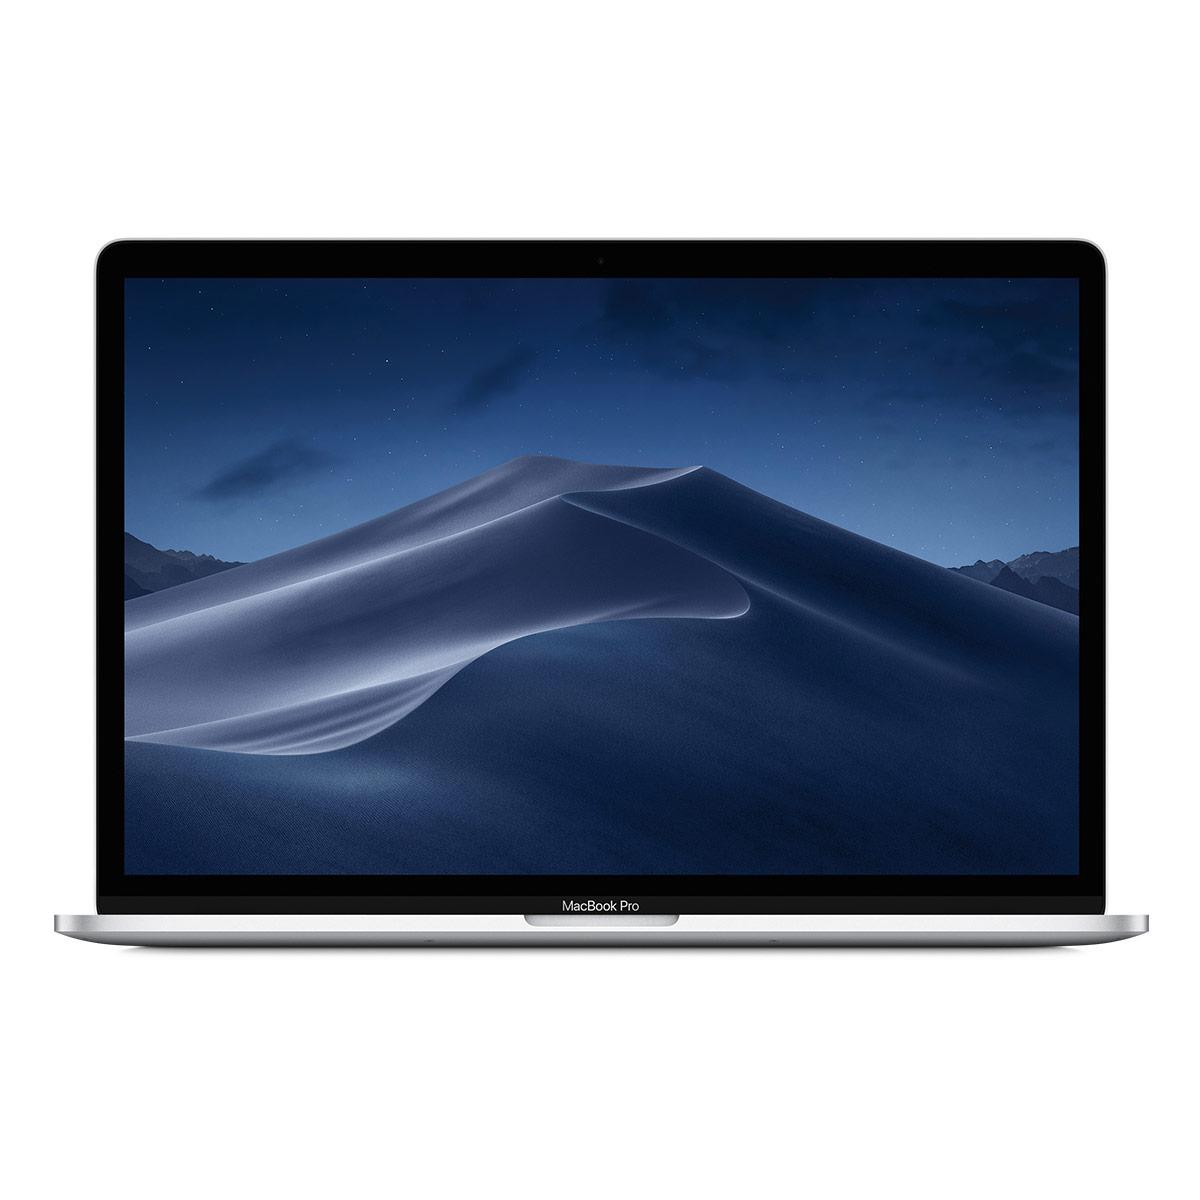 "MacBook Pro 15"" TouchBar 8-core i9 2.3GHz 16GB 512GB 560X Silver"